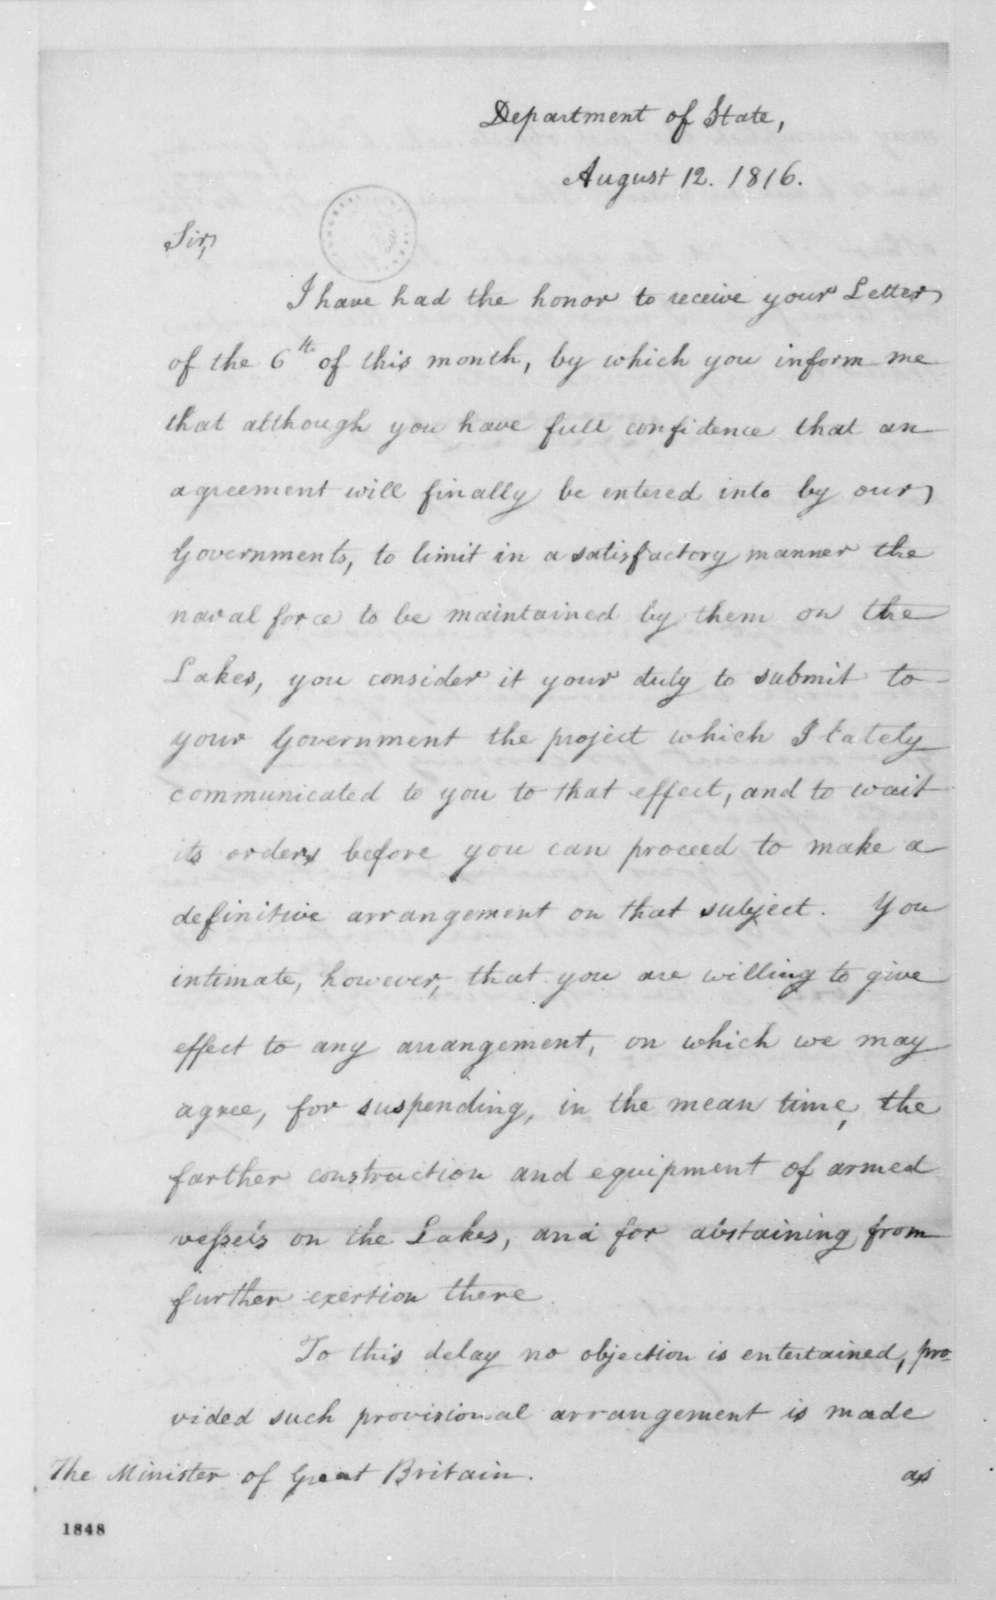 James Monroe to Charles Bagot, August 12, 1816.